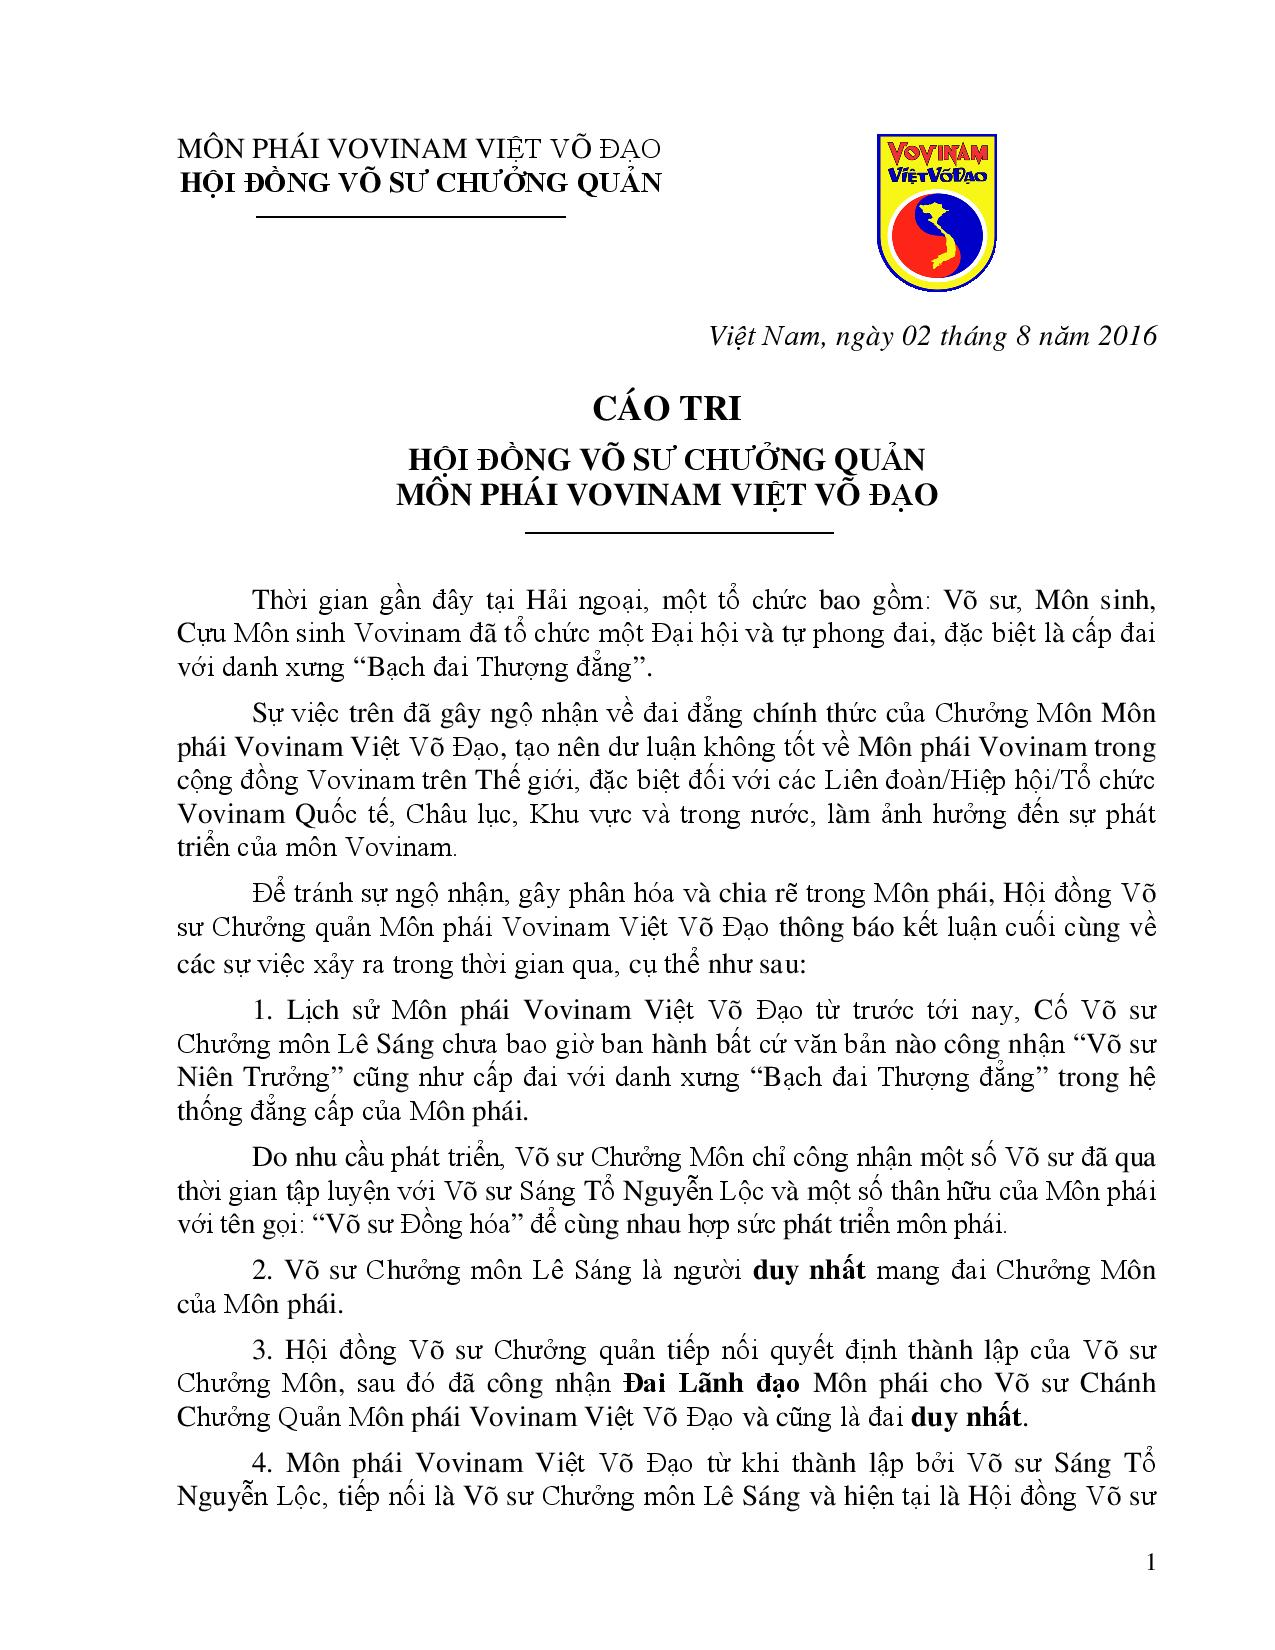 CAO TRI HDVSCQMP 2016-page-001